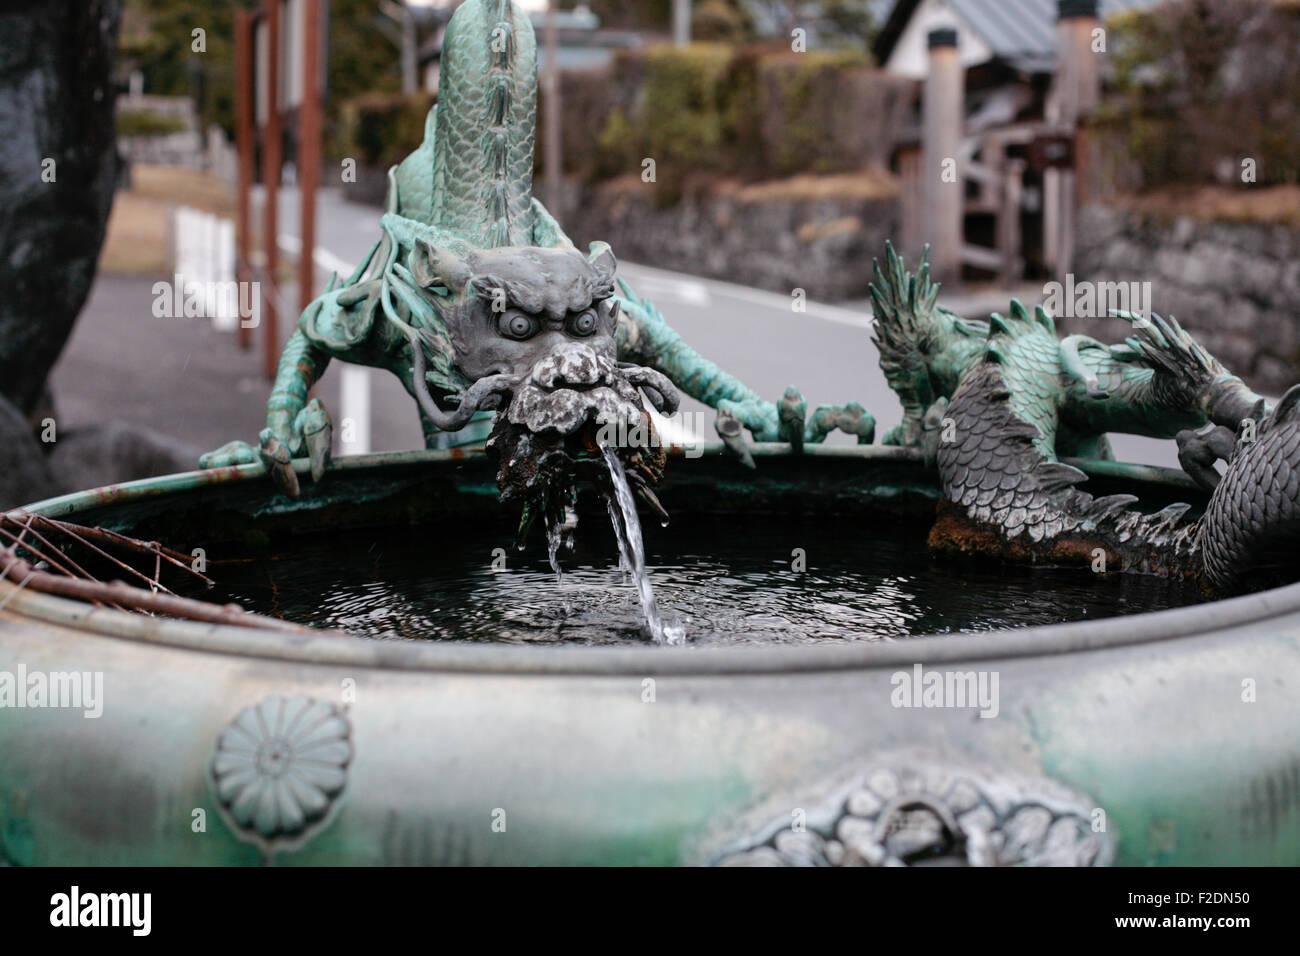 Zodiac Fountain Stock Photos & Zodiac Fountain Stock Images - Alamy